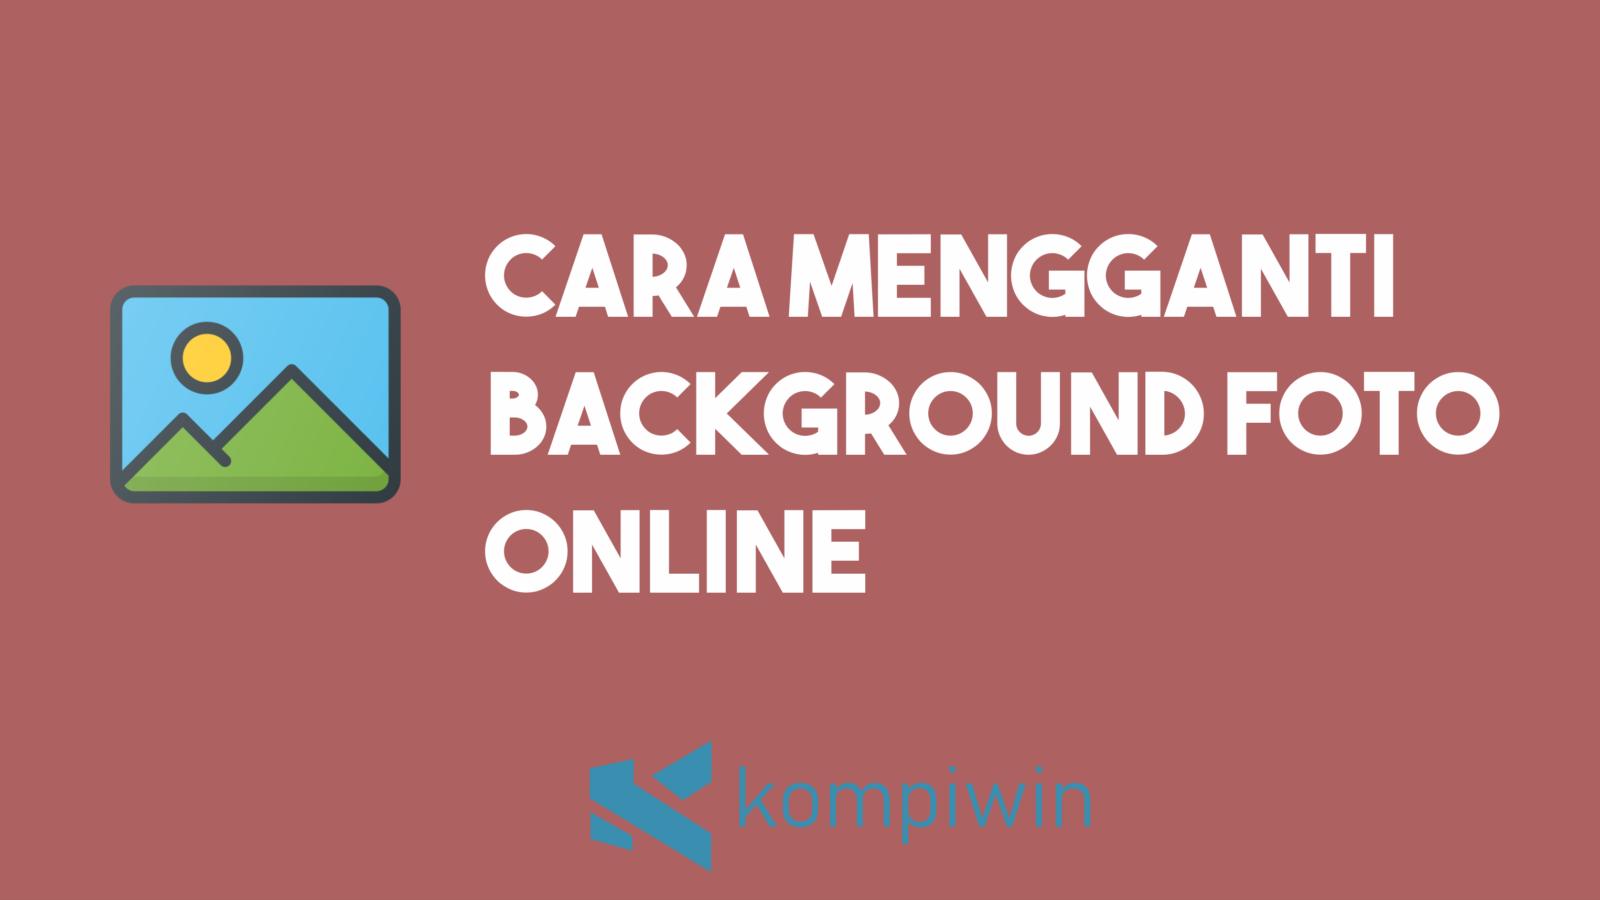 Cara Mengganti Background Foto Online 1